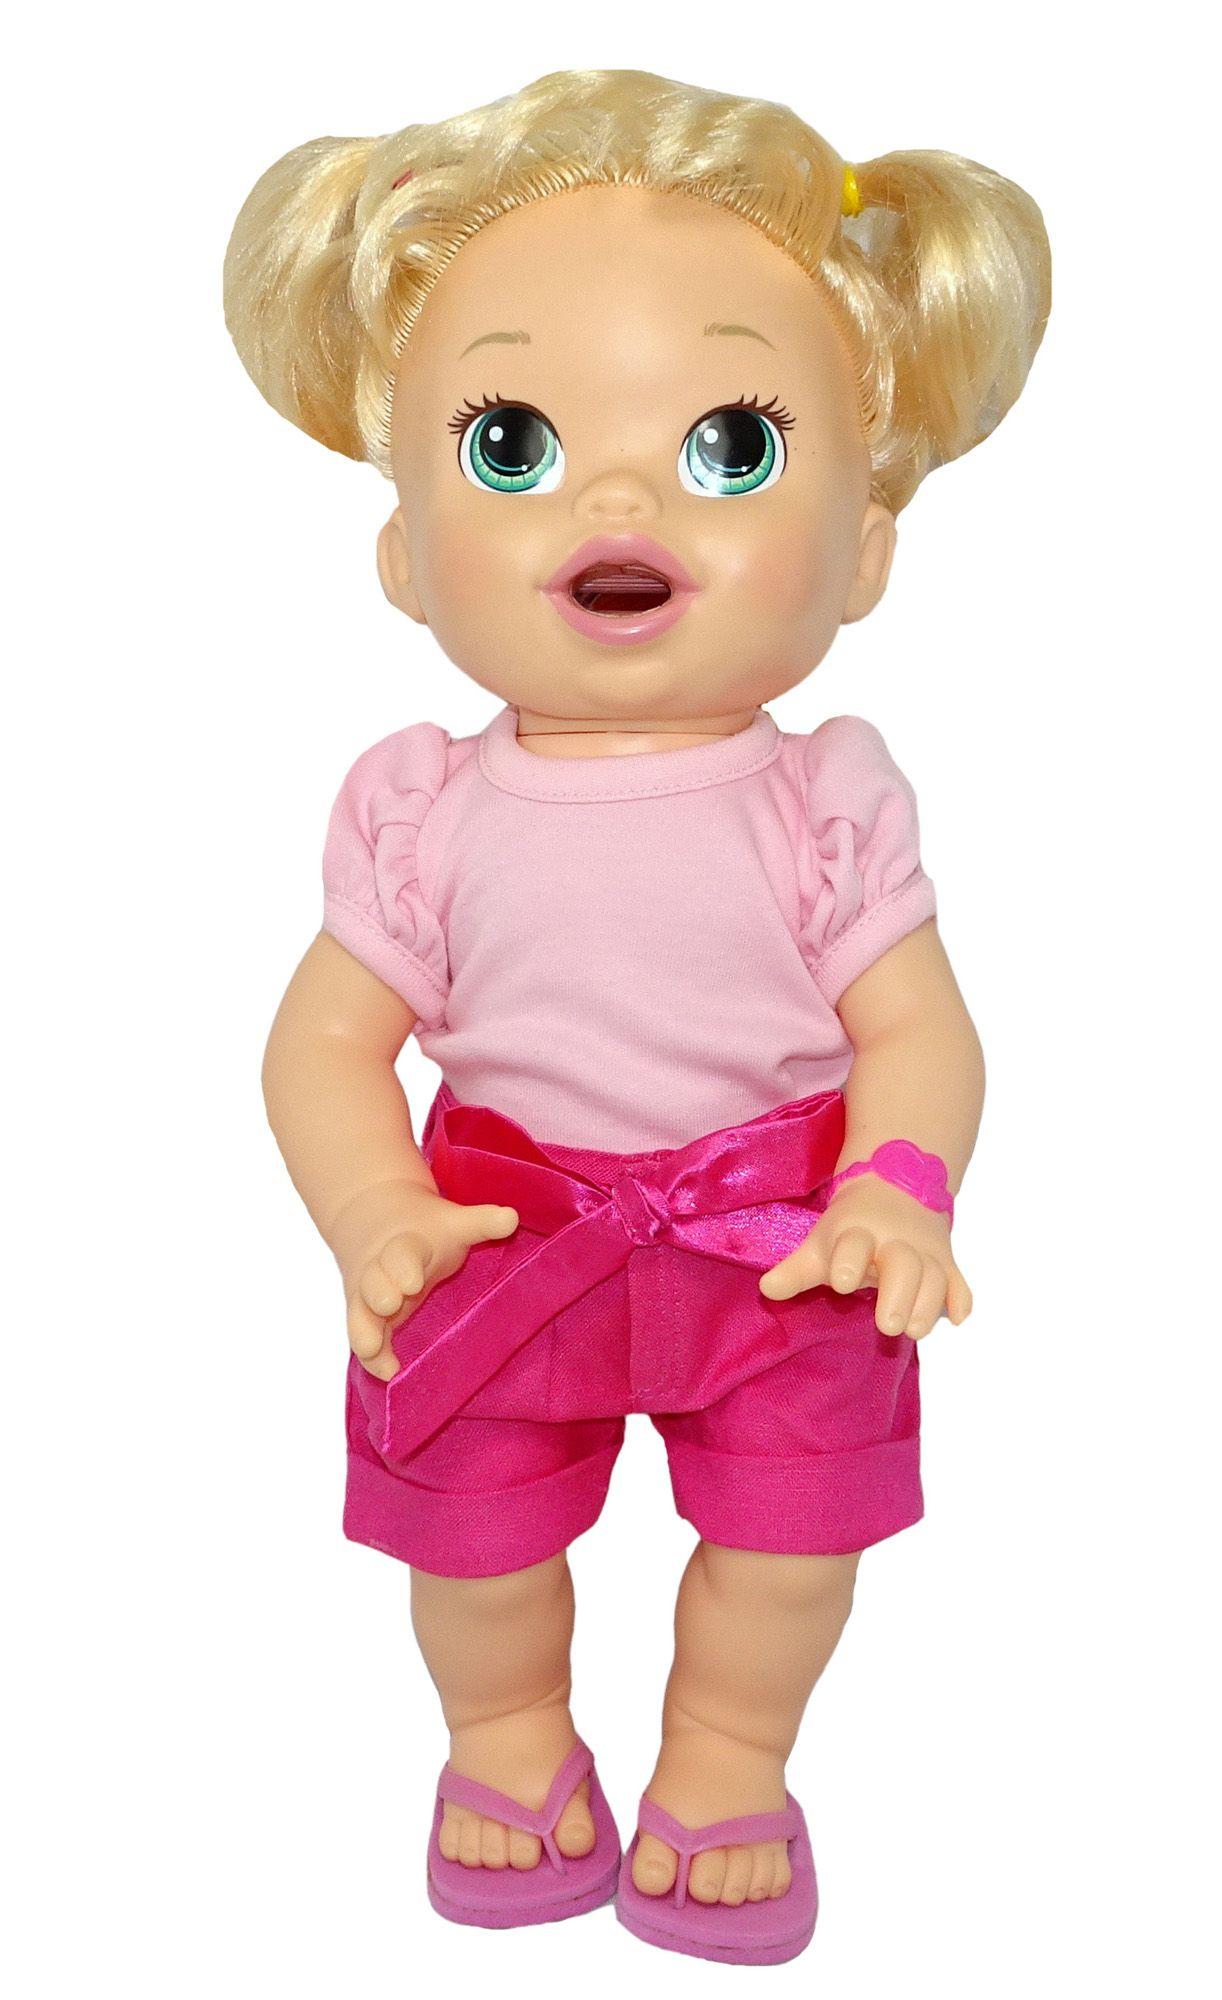 Pink Pleated Shorts Pleated shorts, Disney princess toys